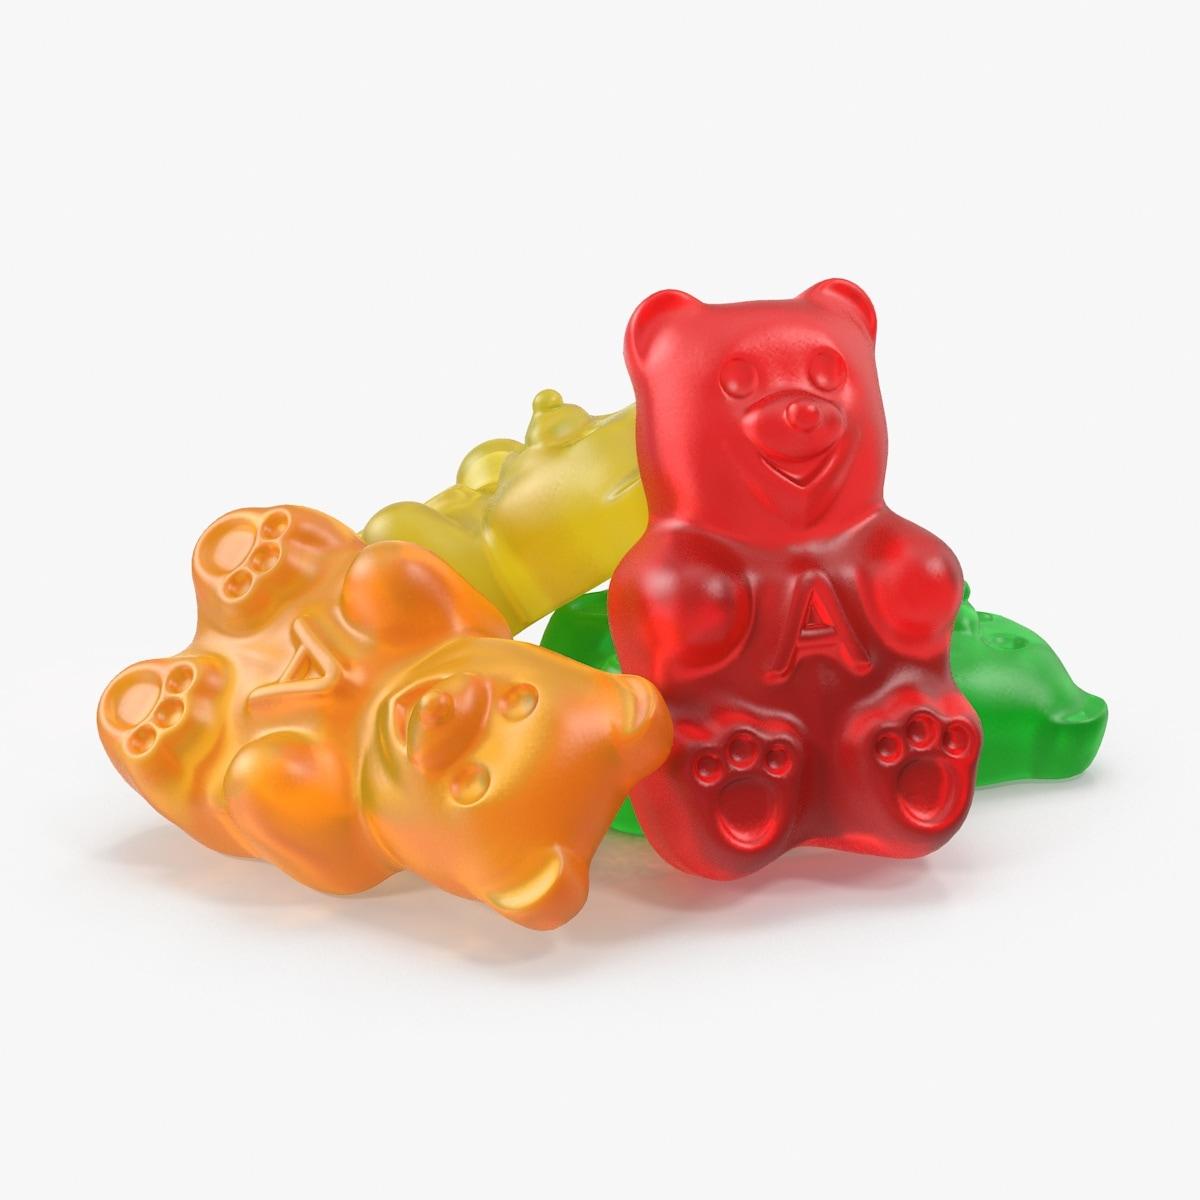 Gummy_bears_SQRSignature_0000.jpg